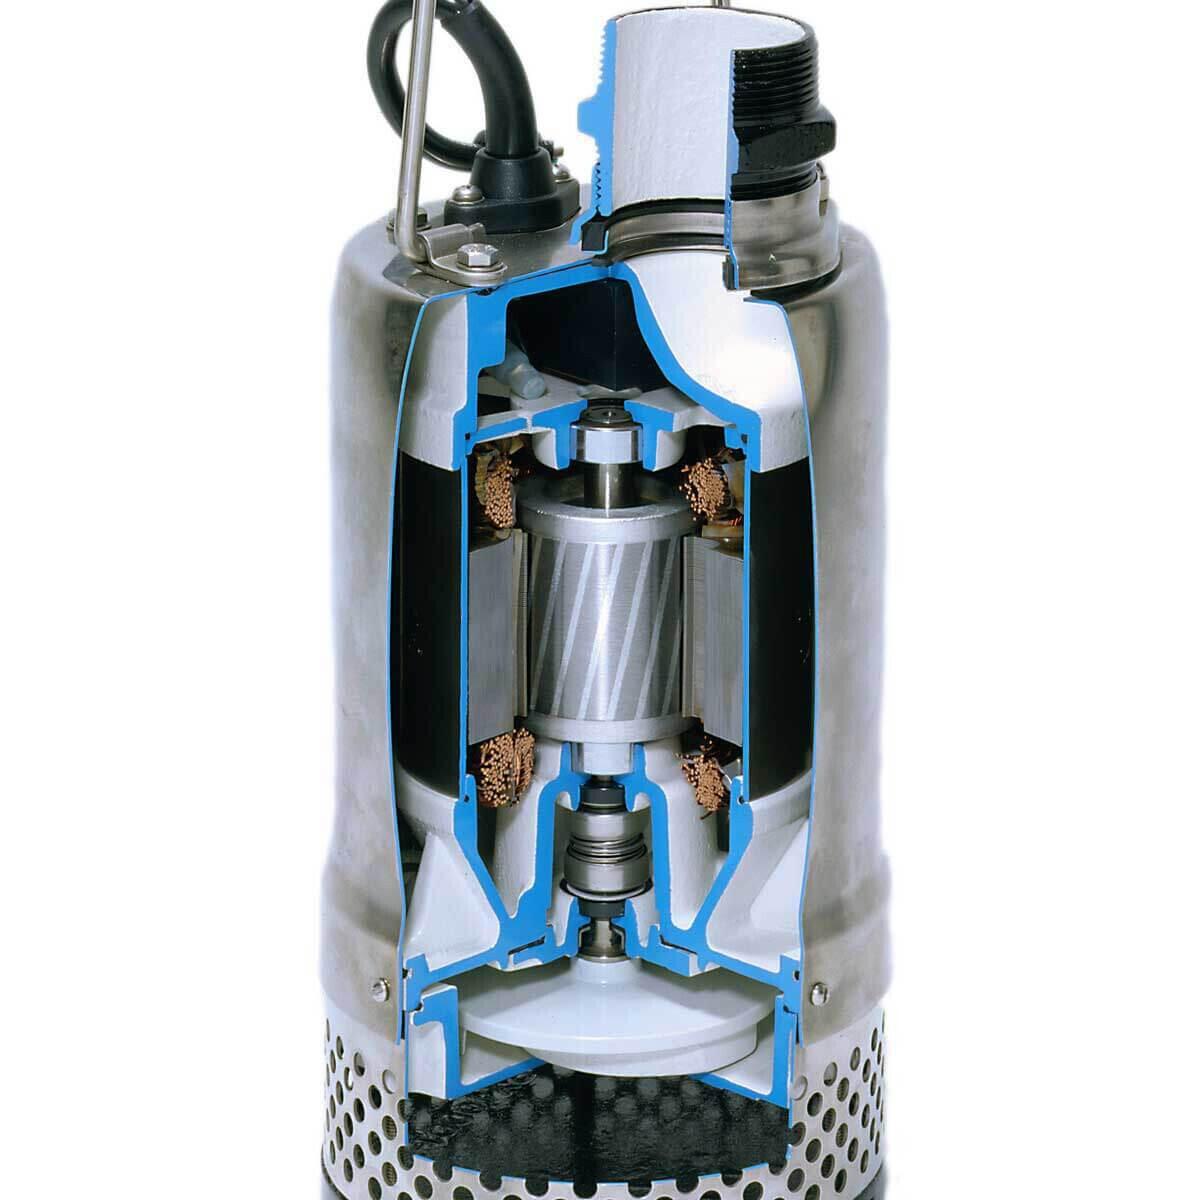 BJM R400 De-Watering Pump